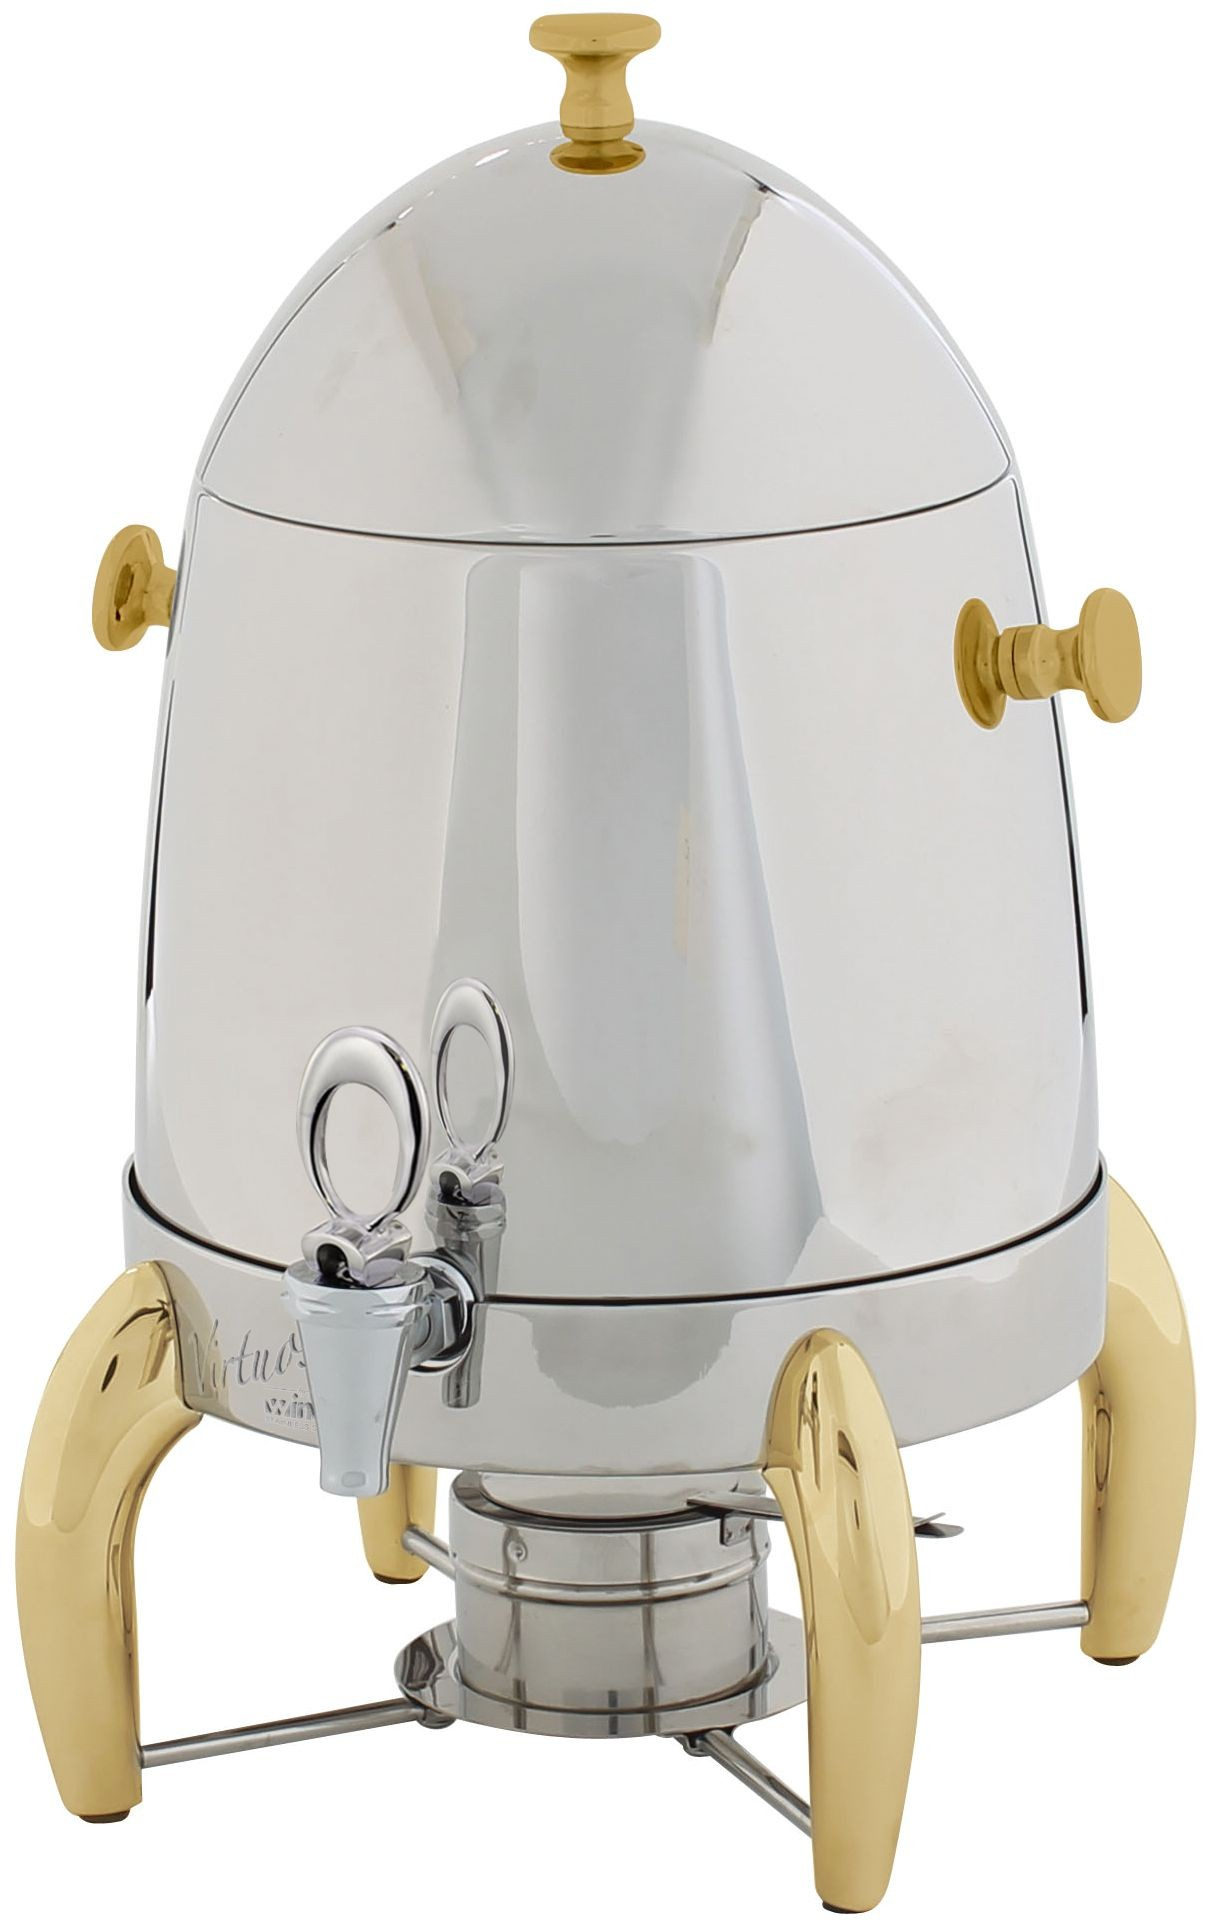 Winco 903a Virtuoso Coffee Urn with Gold Legs, 3 Gallon